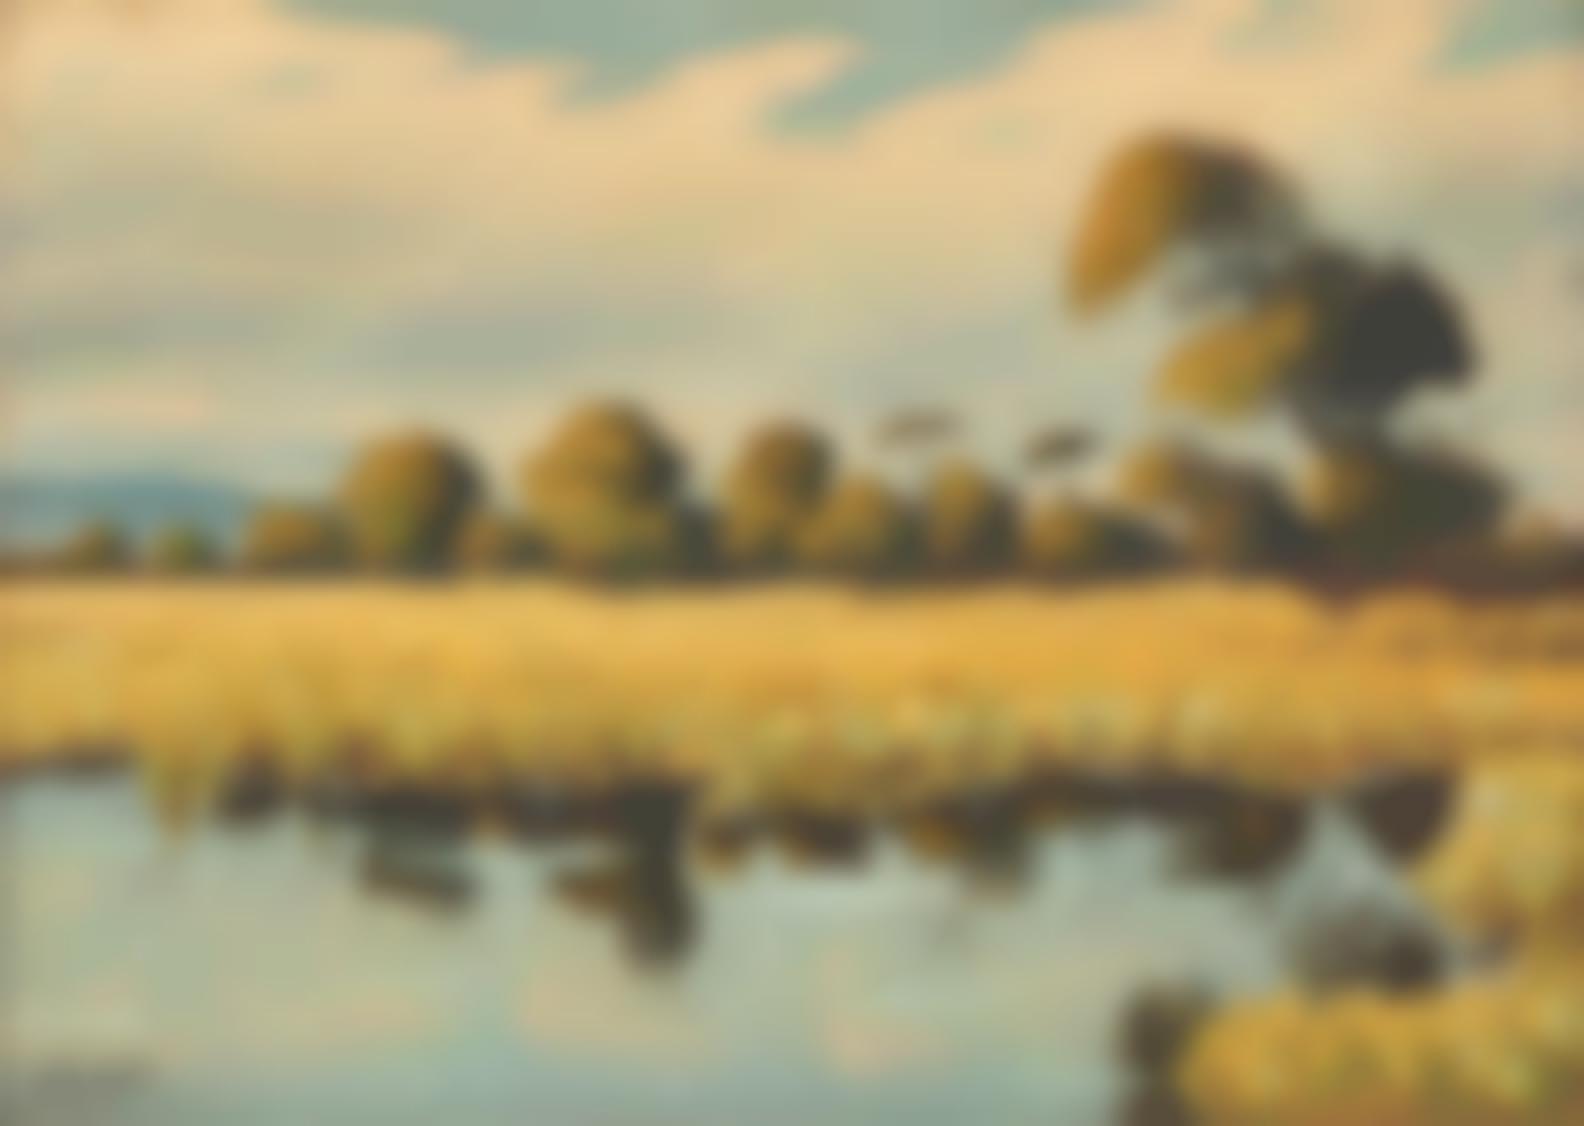 John Koenakeefe Mohl - Pienaars River-